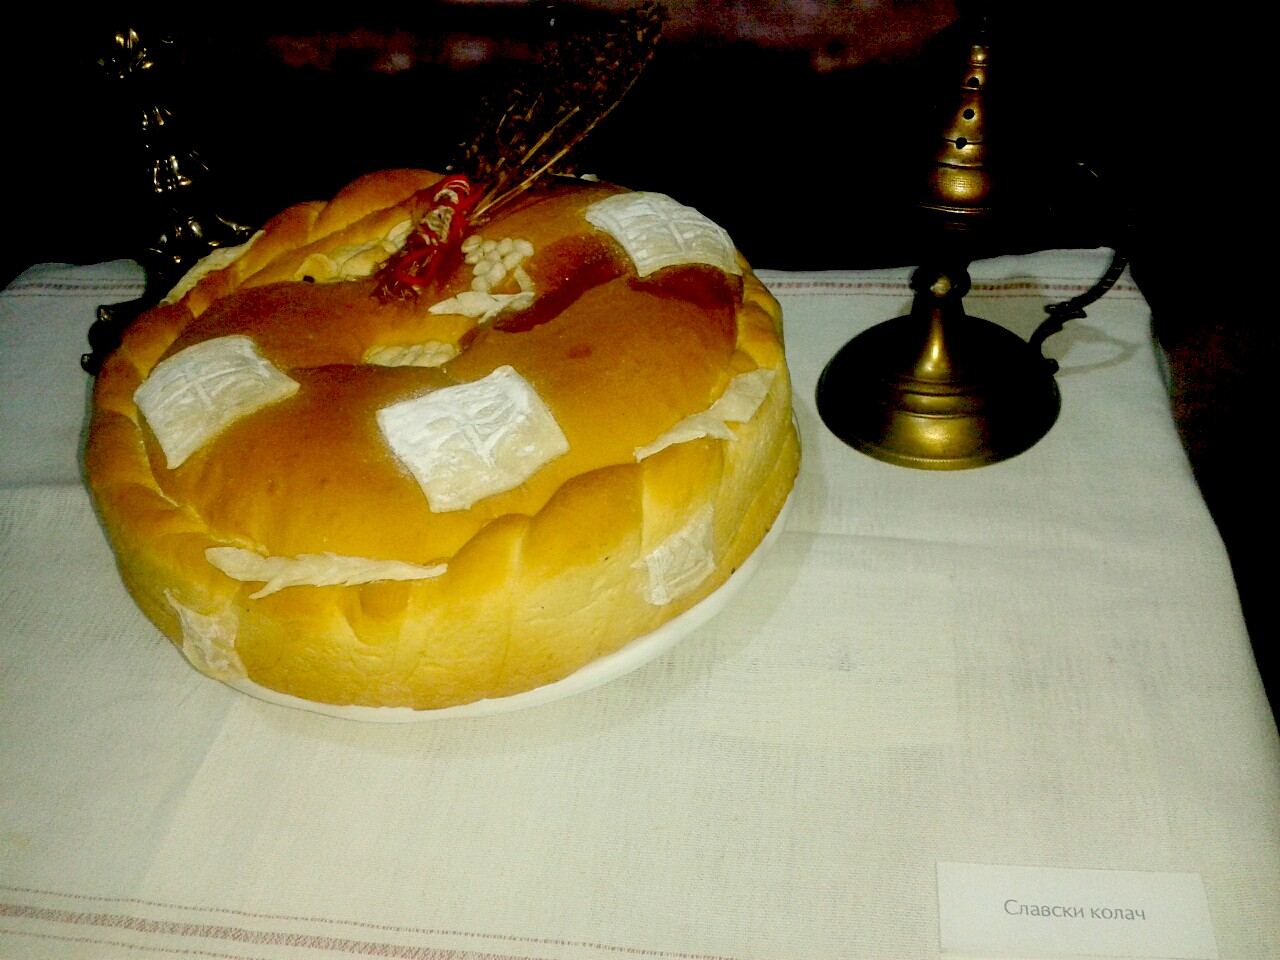 Obredni hlebovi